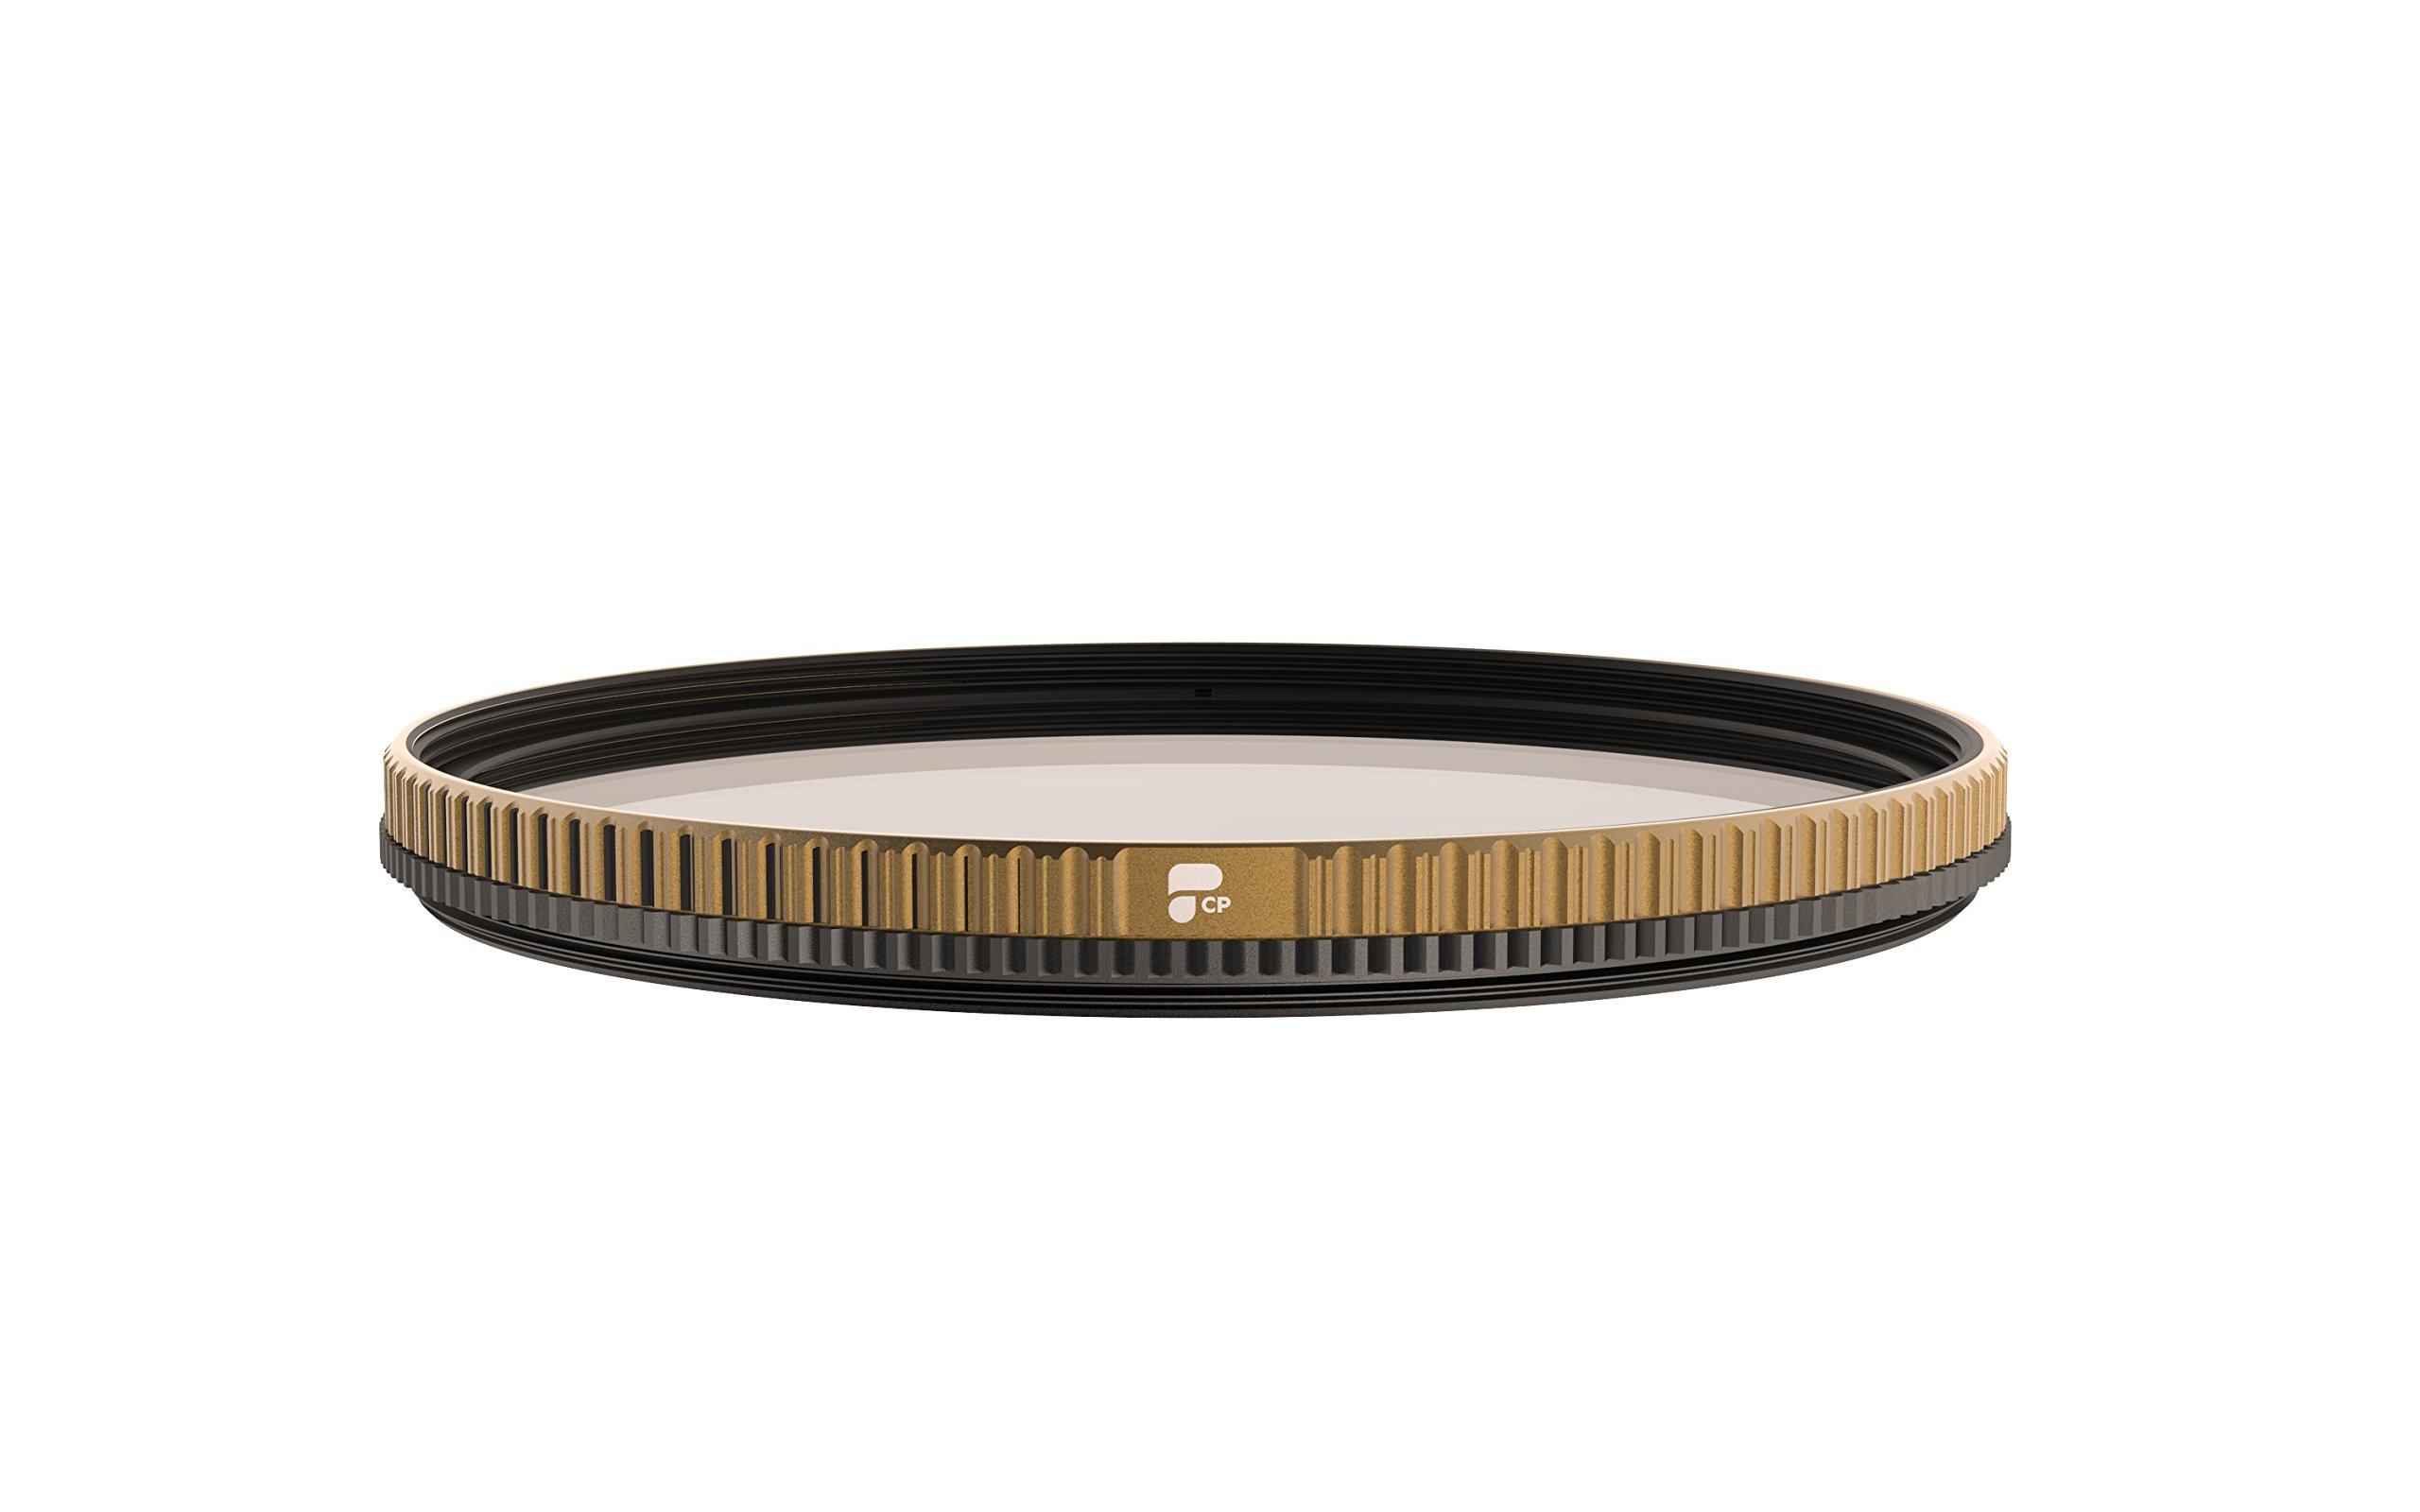 PolarPro QuartzLine 82mm CP Camera Filter (Circular Polarizer Filter)